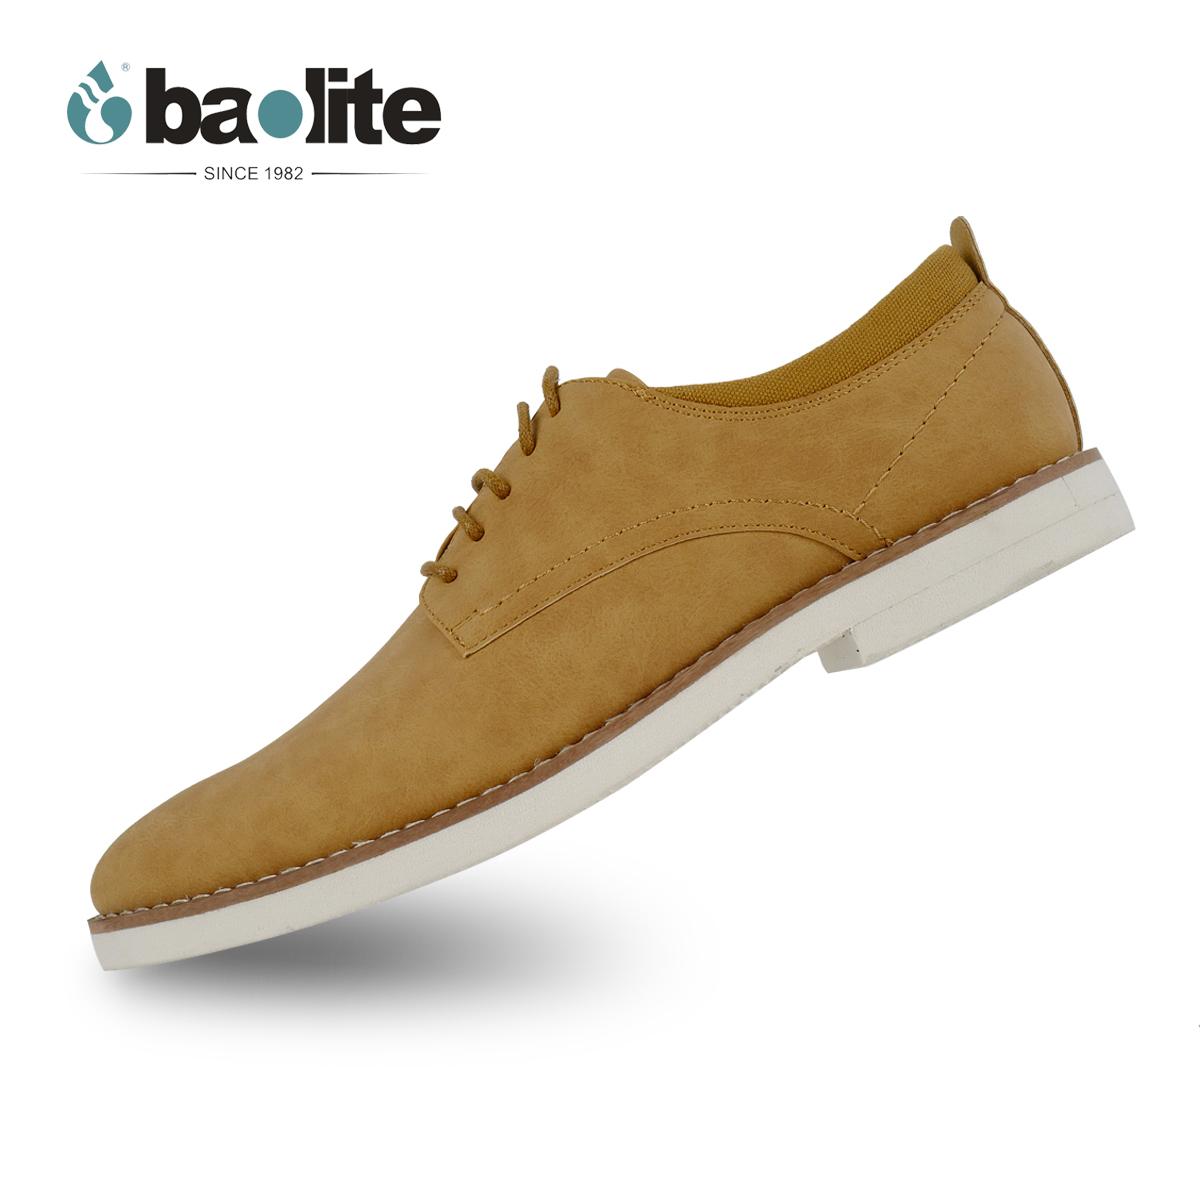 fc76397a5 مصادر شركات تصنيع رجالي أحذية إيطالية ورجالي أحذية إيطالية في Alibaba.com